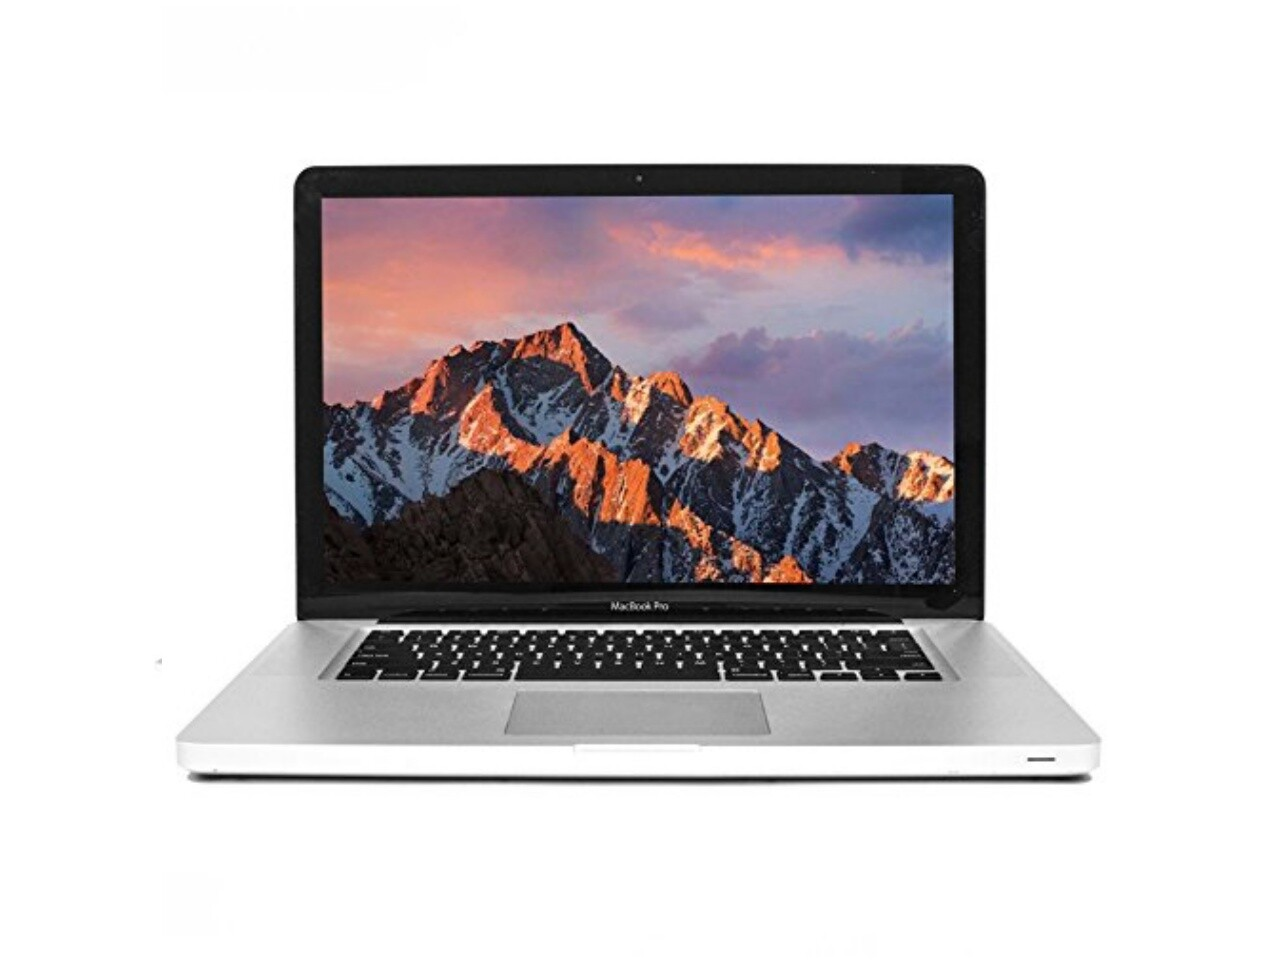 macbook pro 15 pouces intel i7 ordizone qu bec